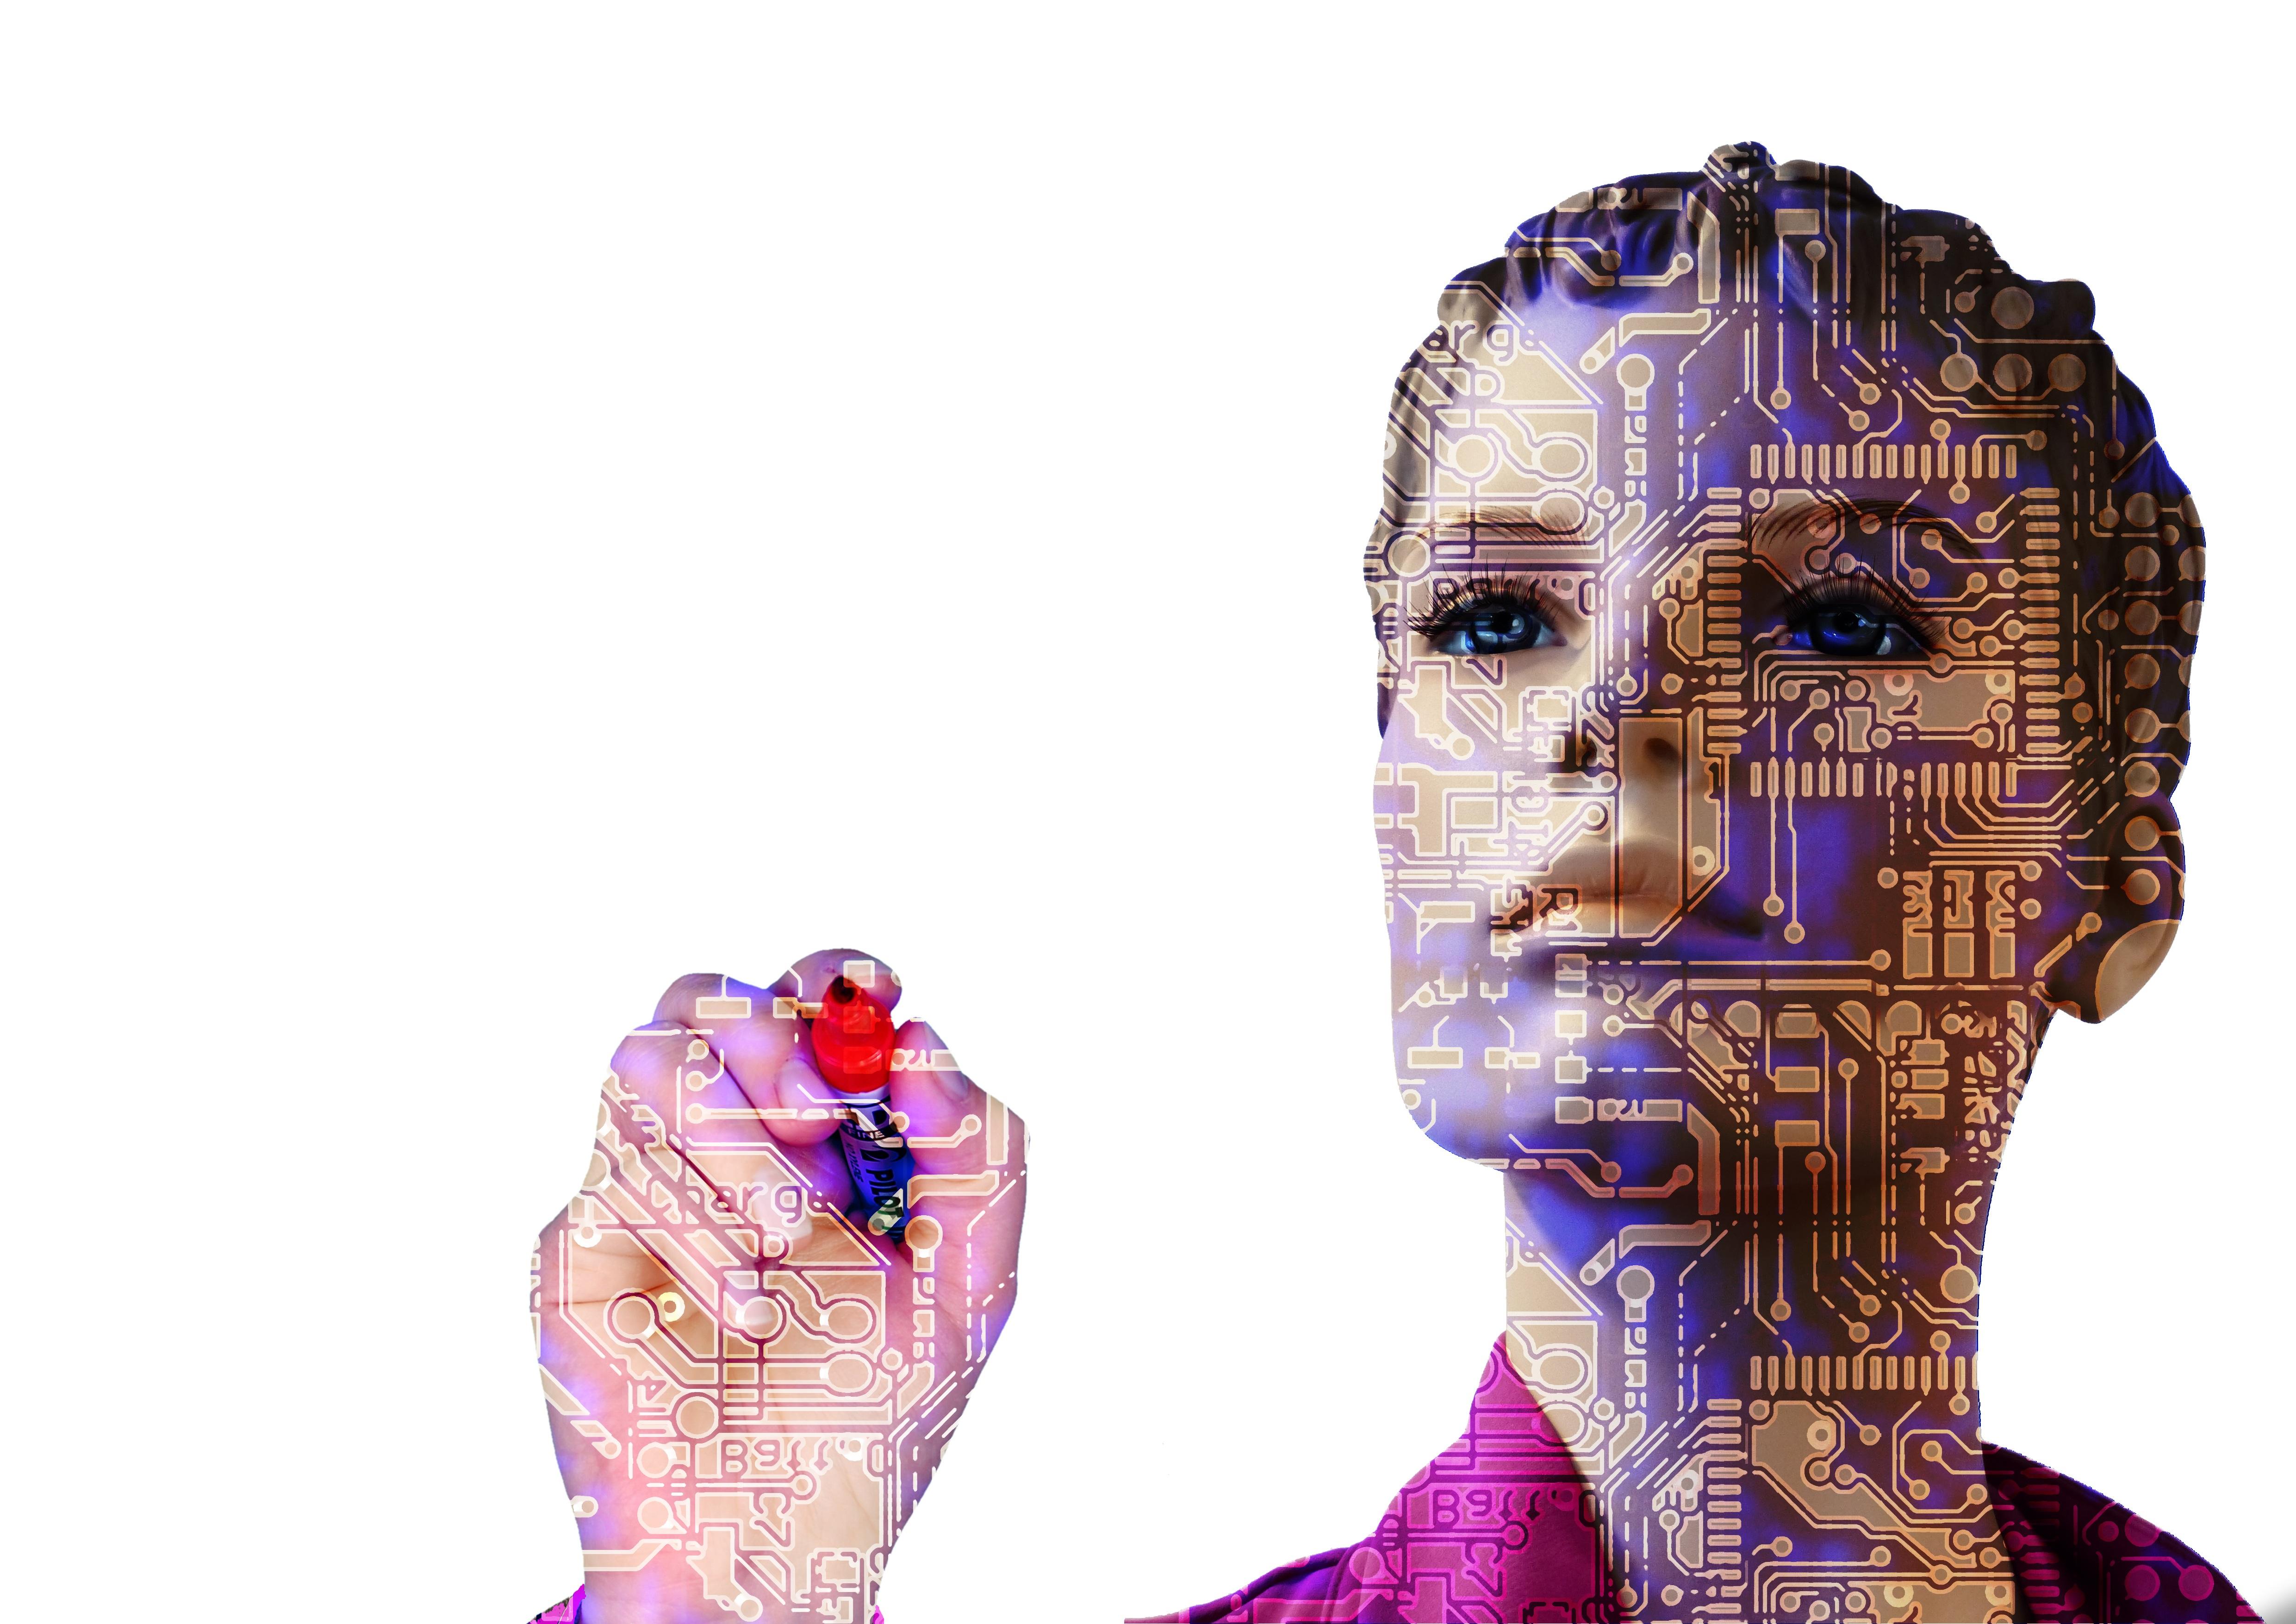 Welche Rolle spielt Social Media in der digitalen Transformation?